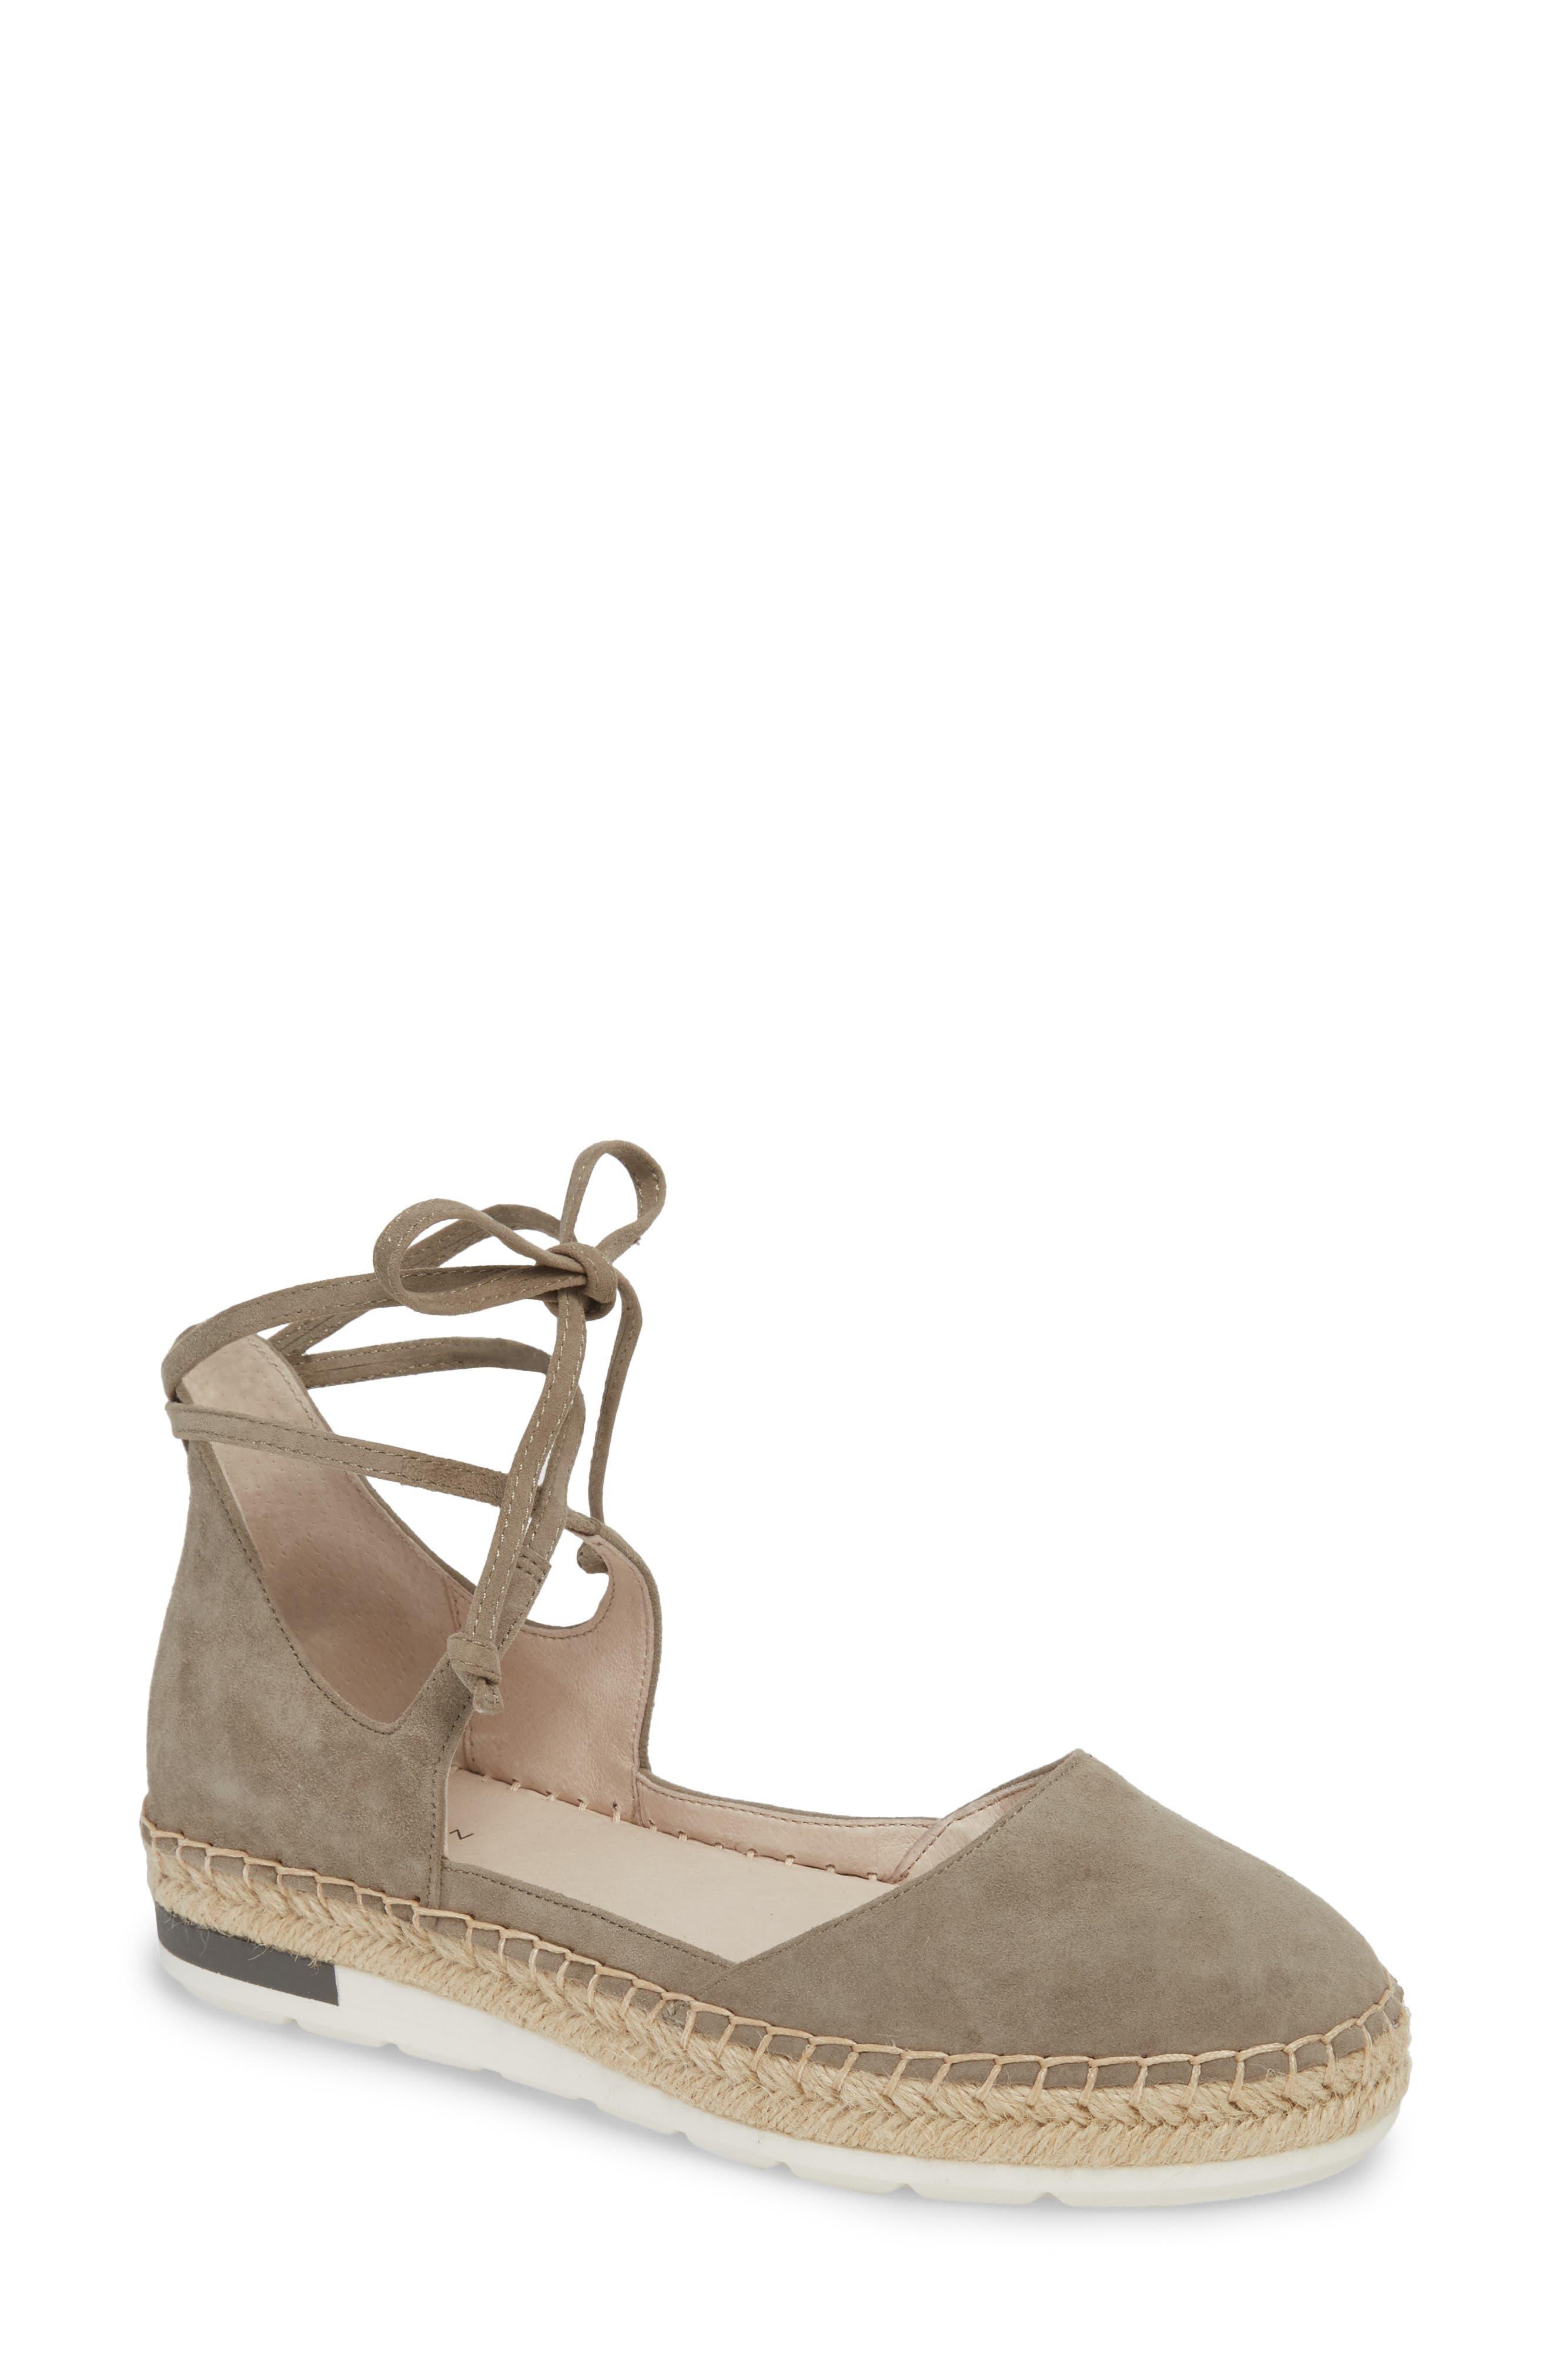 Leena Ankle Strap Sandal,                             Main thumbnail 1, color,                             Grey Suede